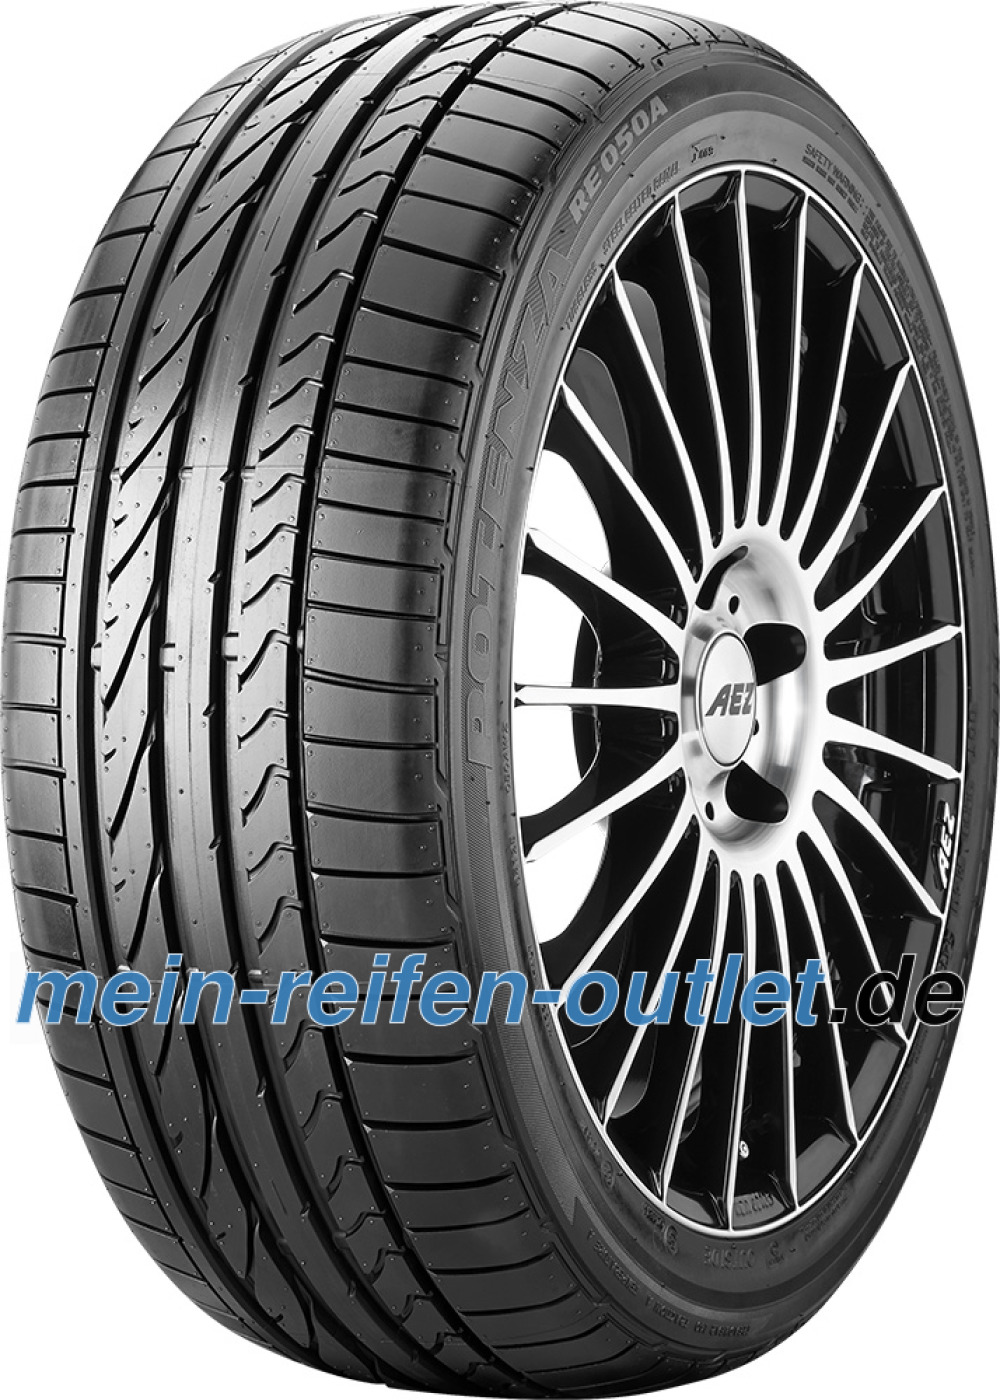 Bridgestone Potenza RE 050 A ( 245/35 ZR20 (91Y) mit Felgenschutz (MFS) )